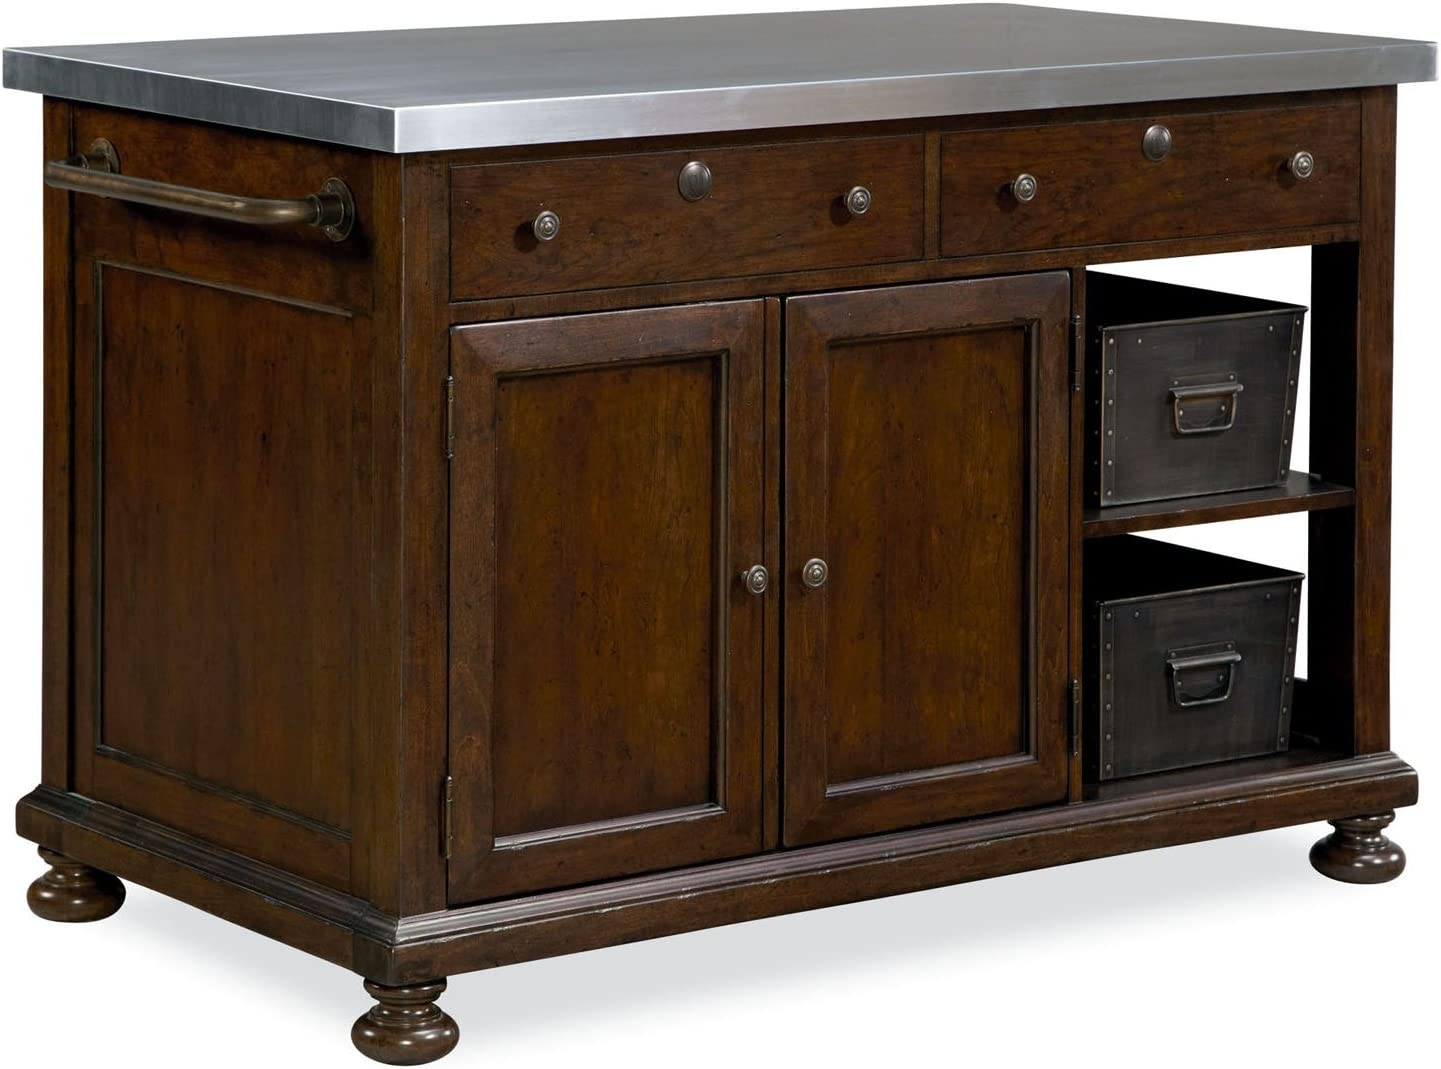 Simple Office Room Design, Amazon Com Paula Deen River House Kitchen Island 393644 Kitchen Islands Carts